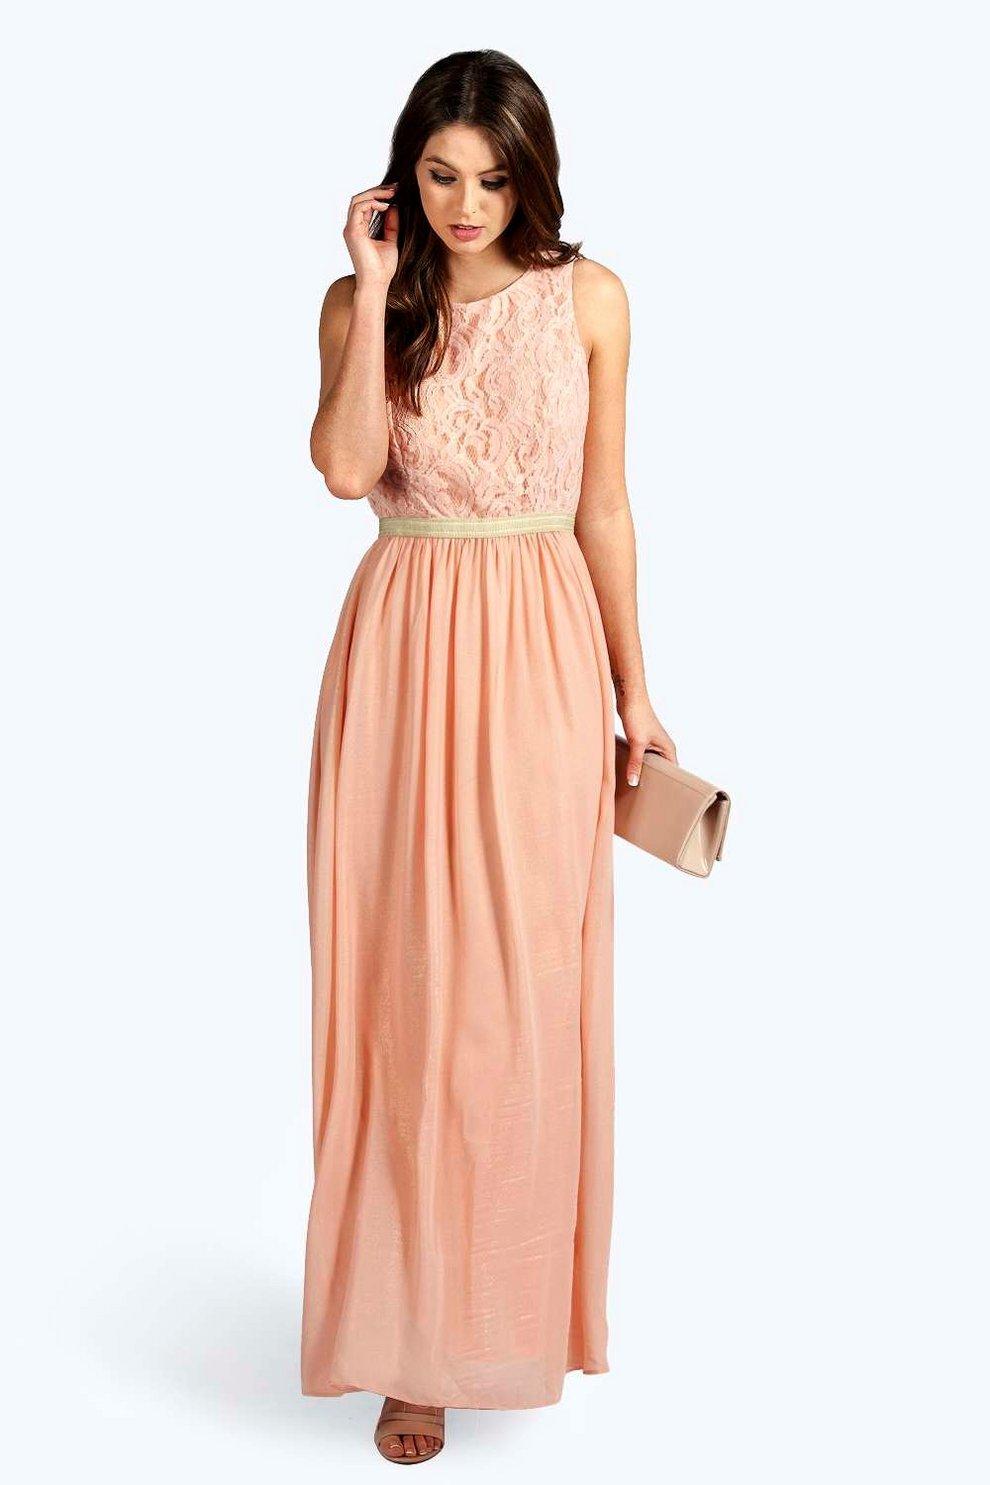 Quinceanera pretty dresses photo